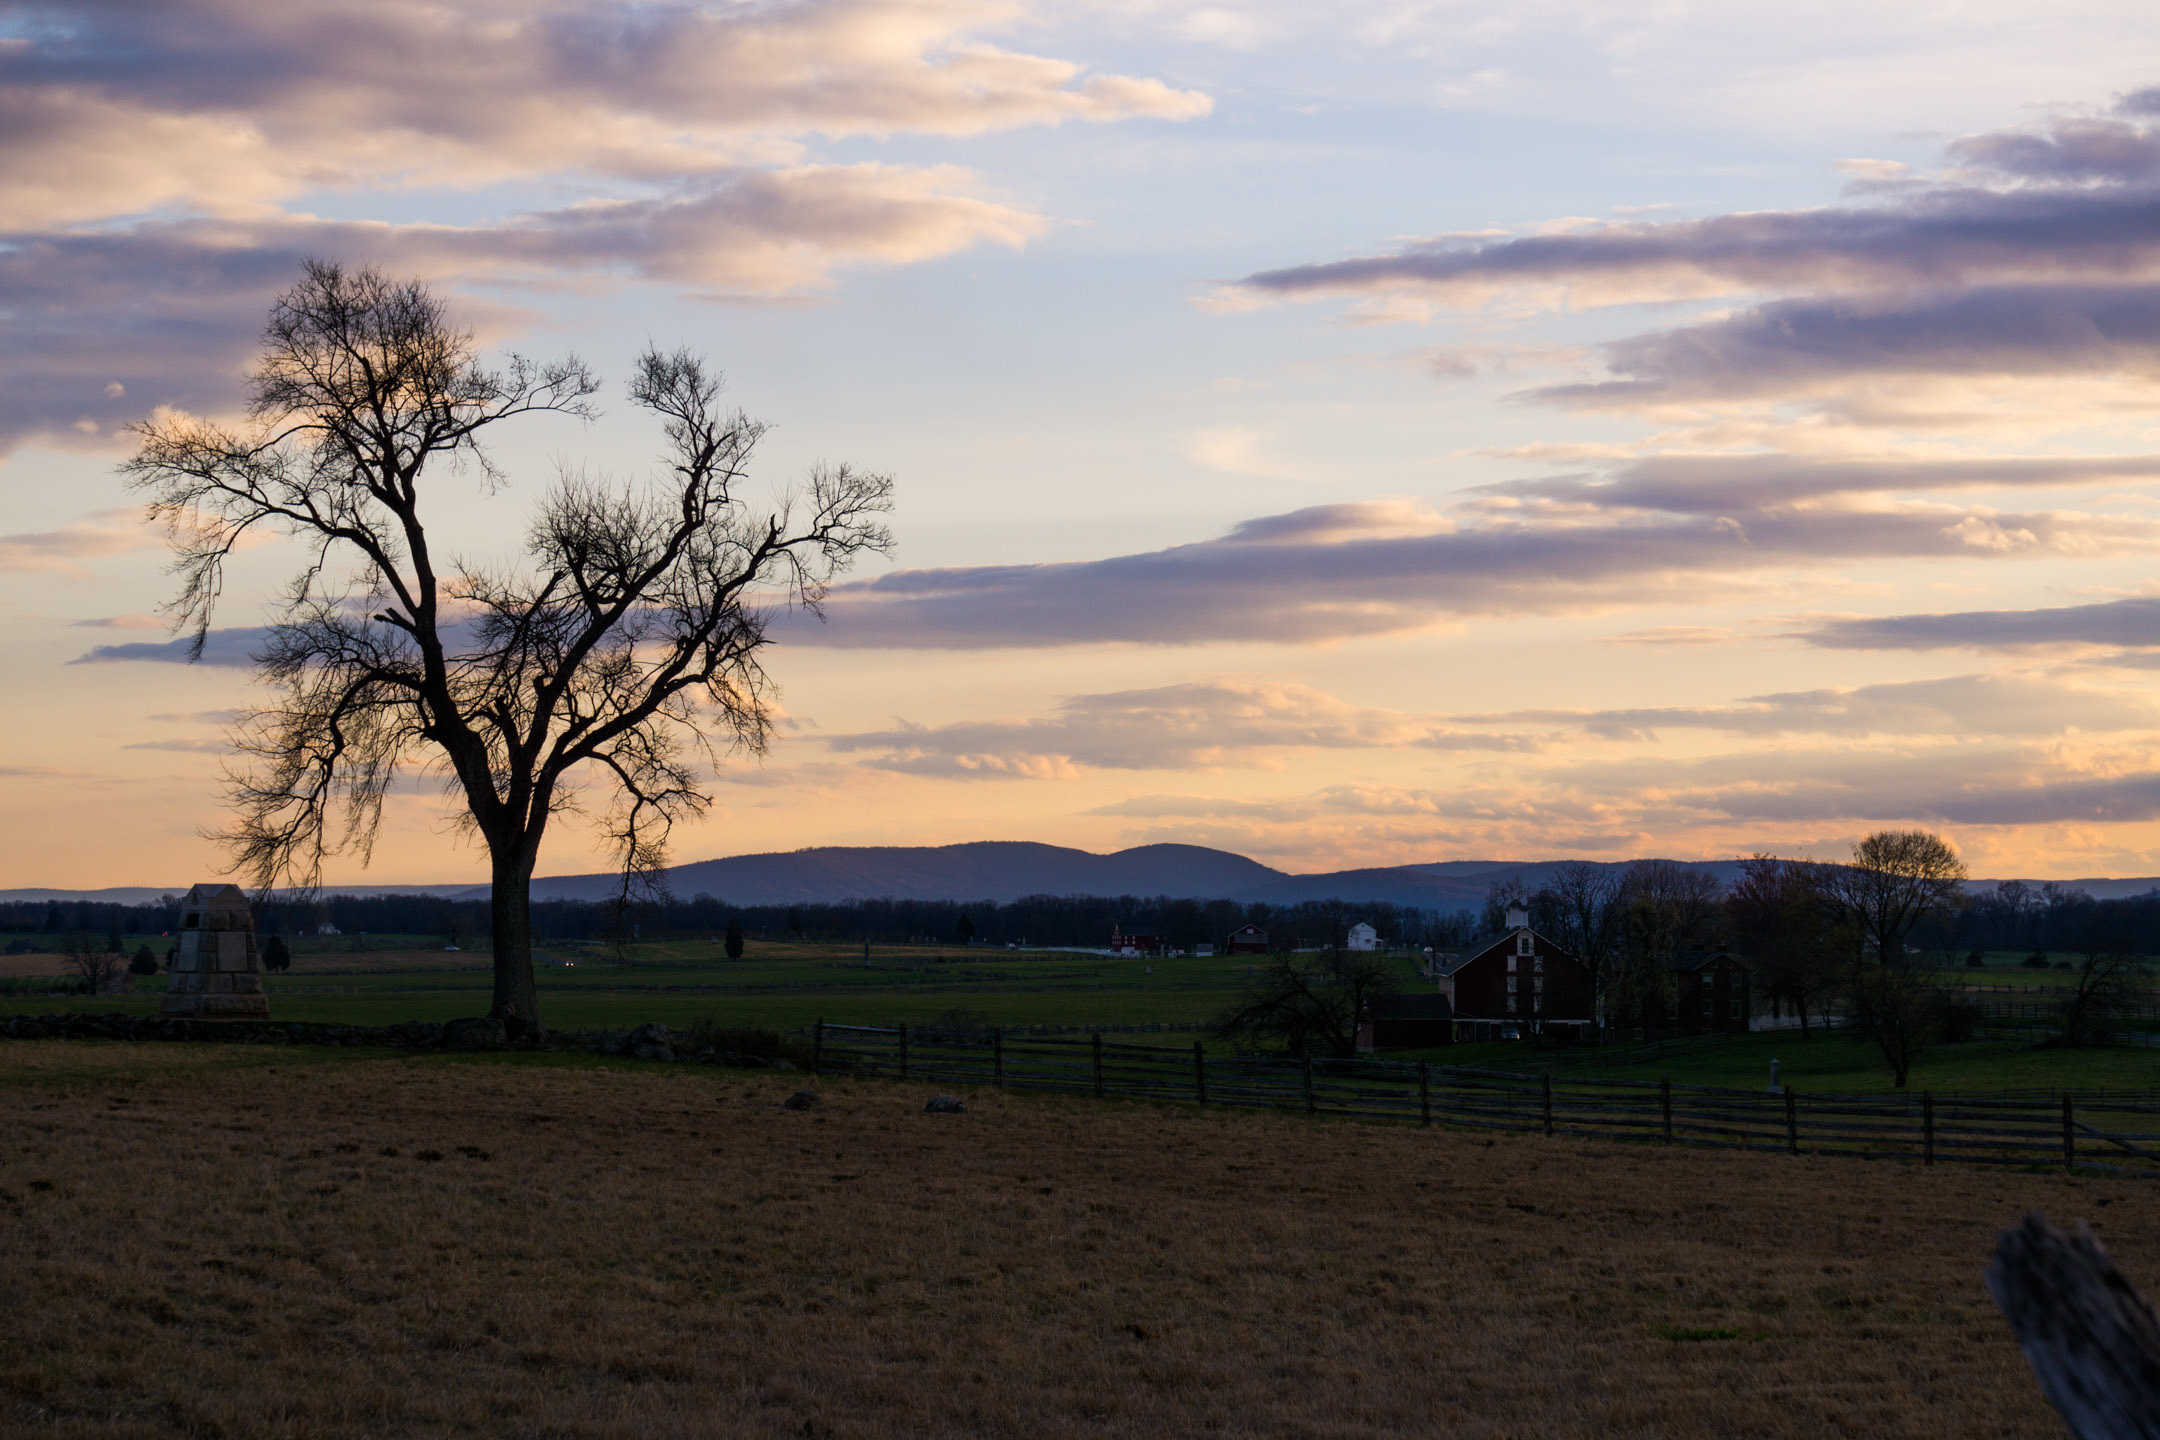 Ups gettysburg